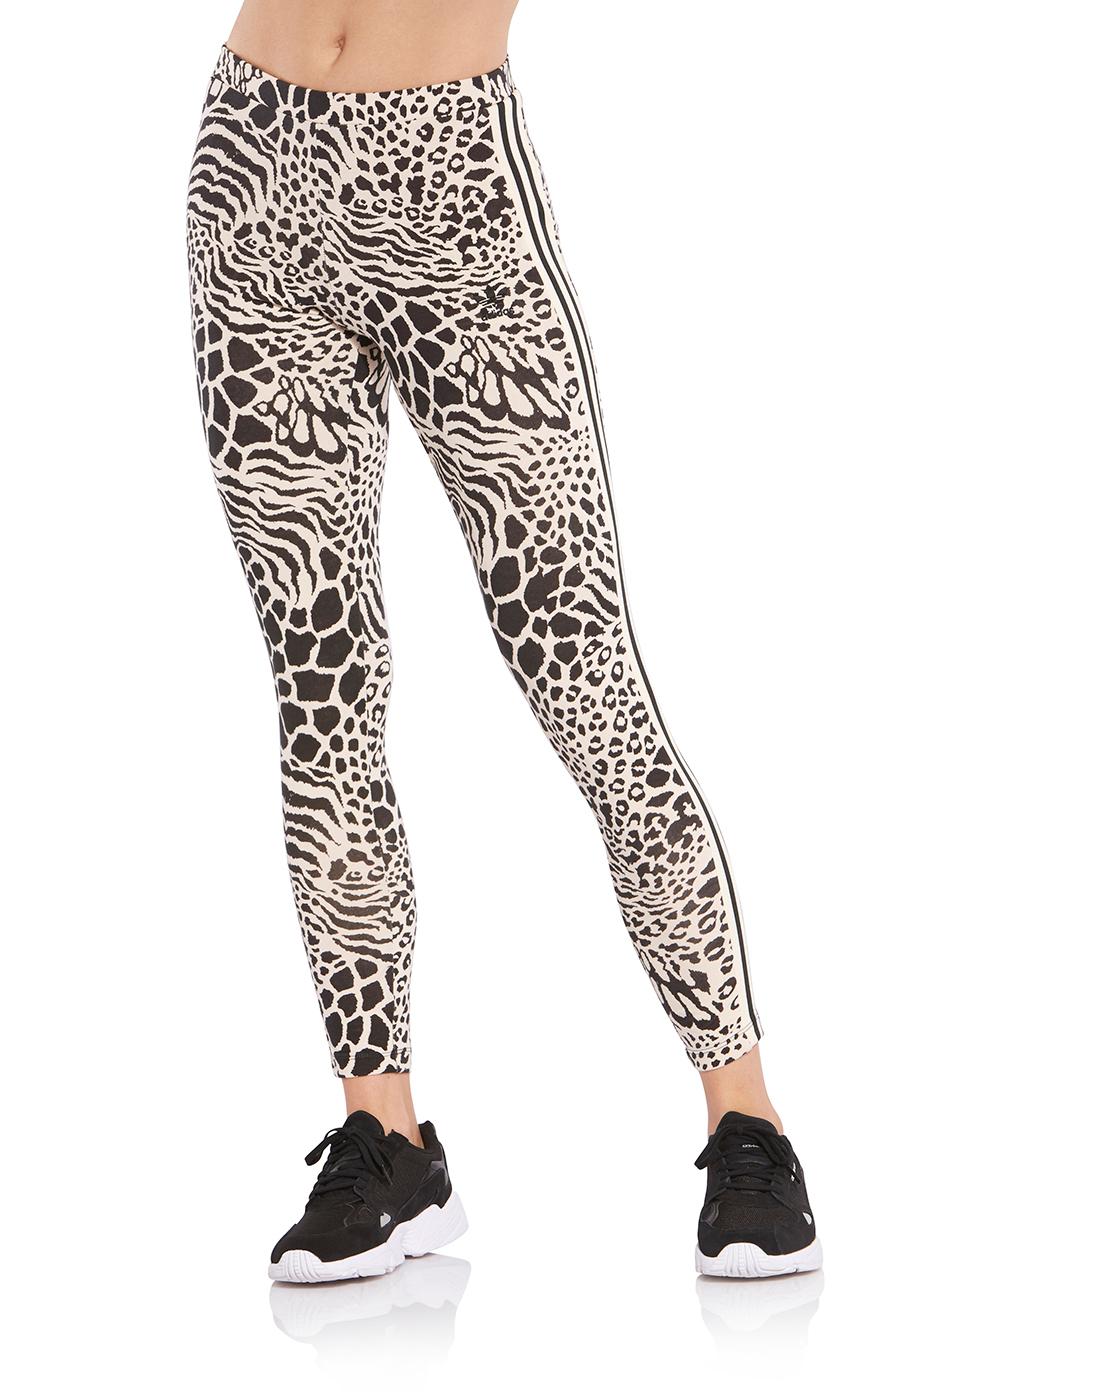 89e39042f91c Women's Leopard Print adidas Originals Leggings | Life Style Sports